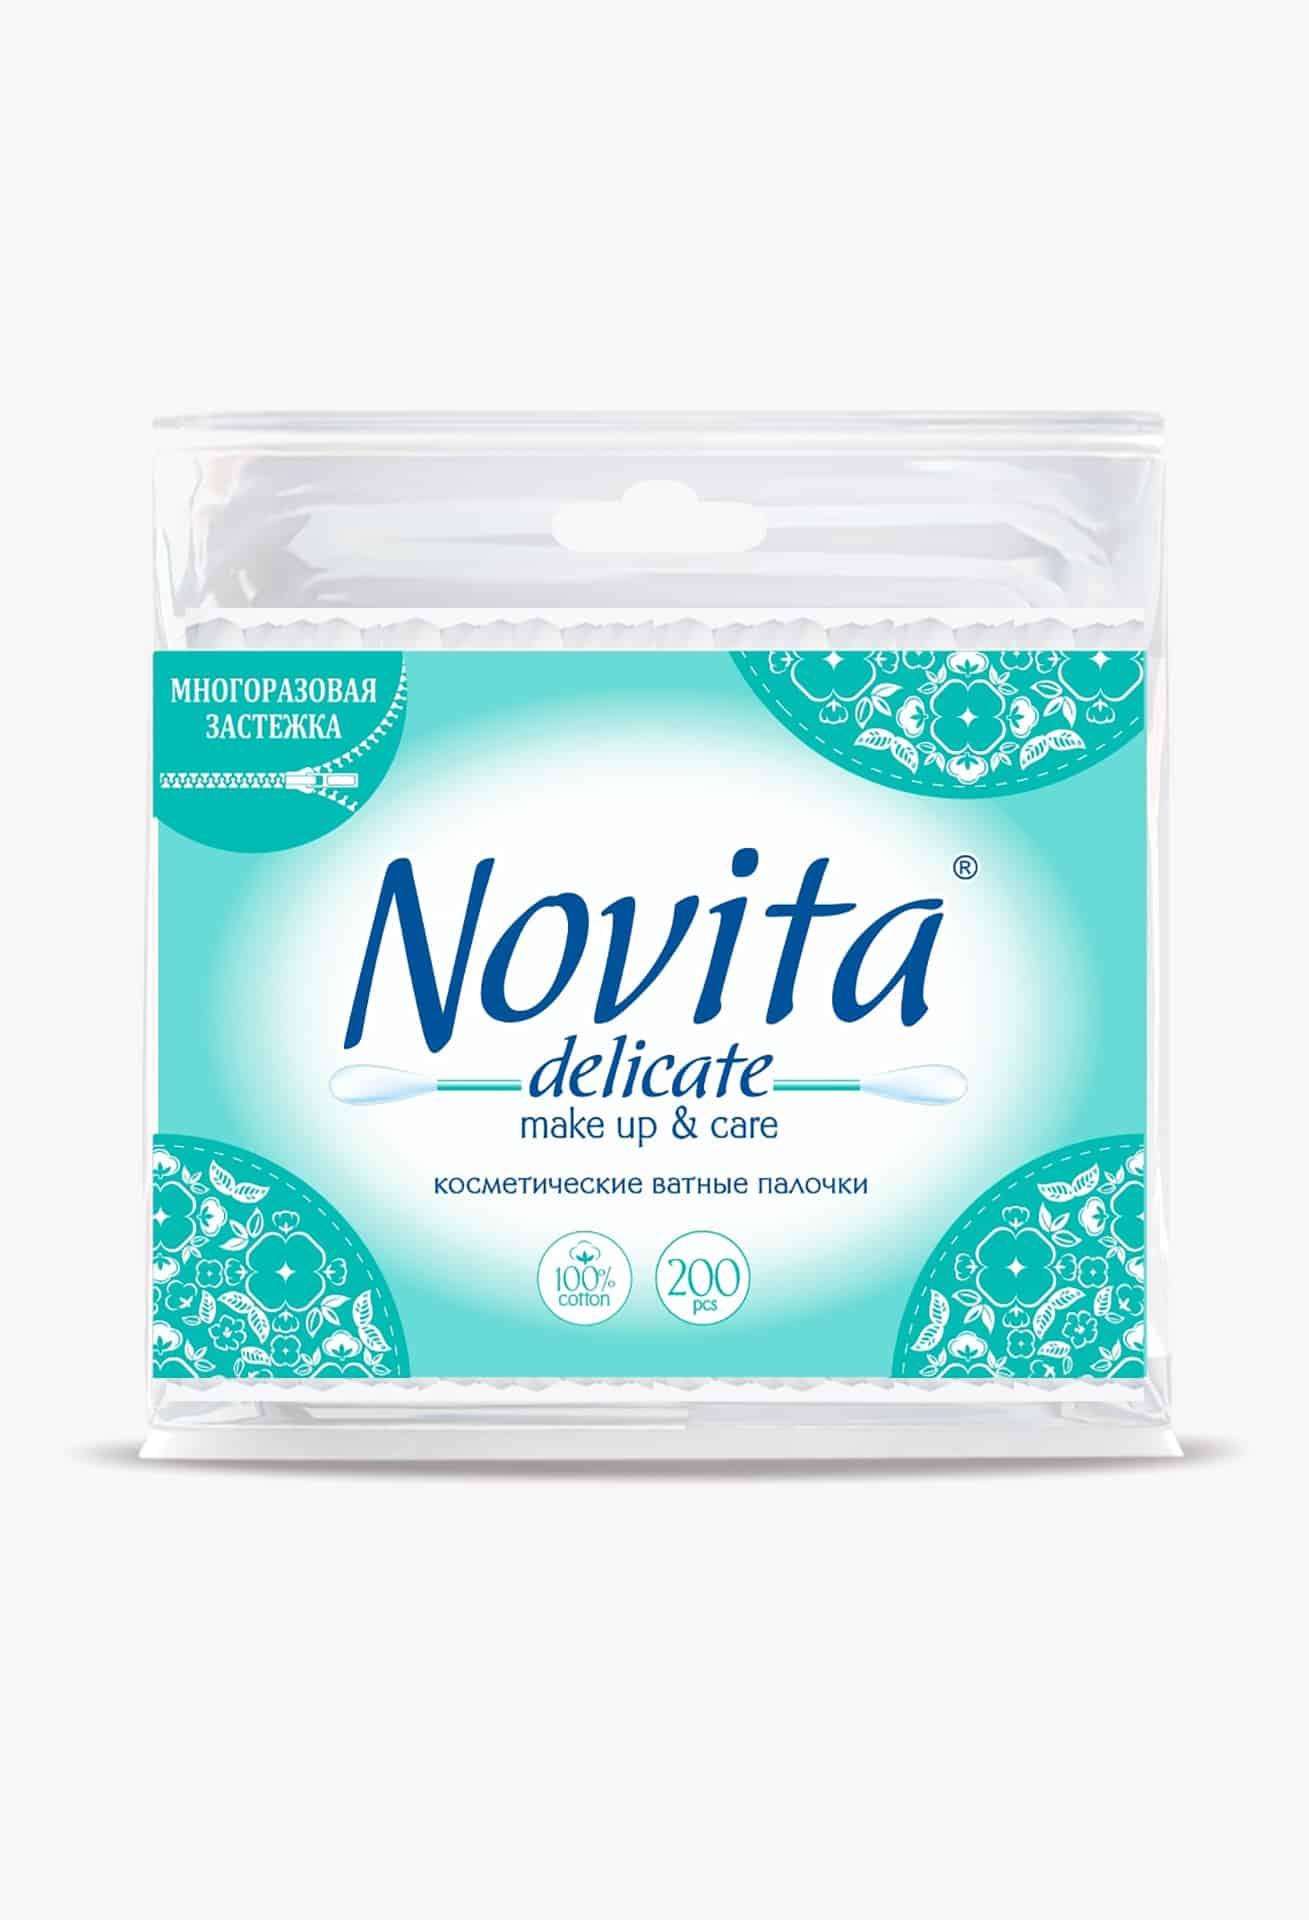 NOVITA Delicate Палички ватні в поліетиленовому пакеті, 200шт.